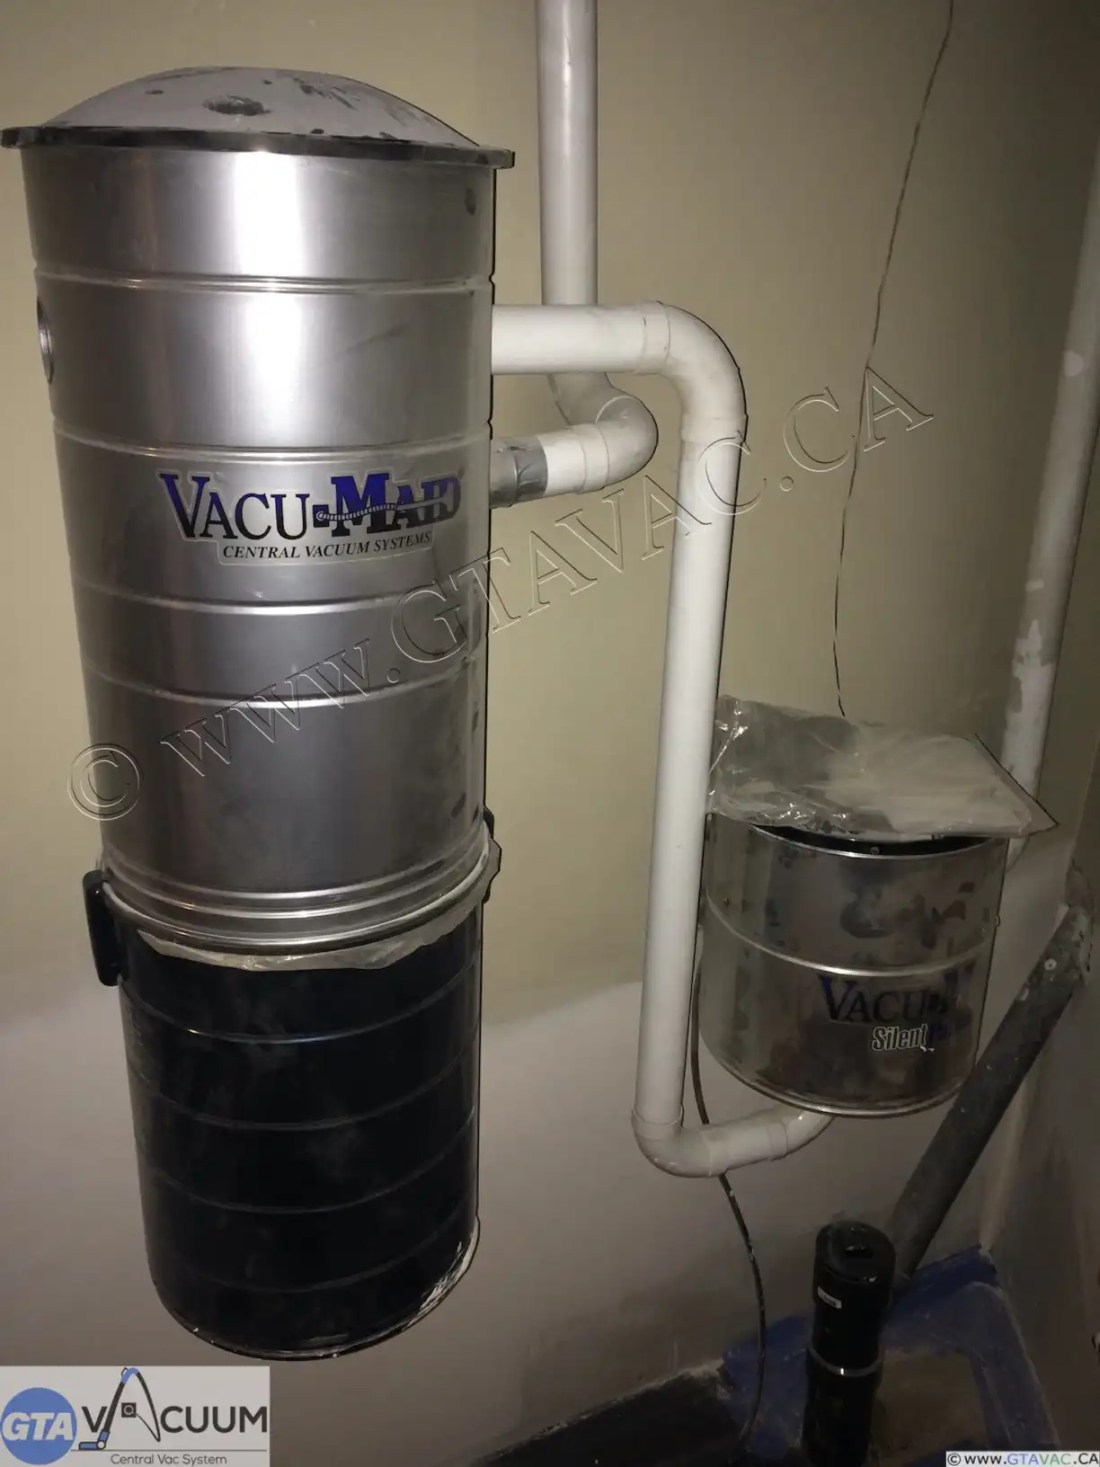 VacuMaid Central Vacuum GTA Vacuum Recent Project Gallery 1